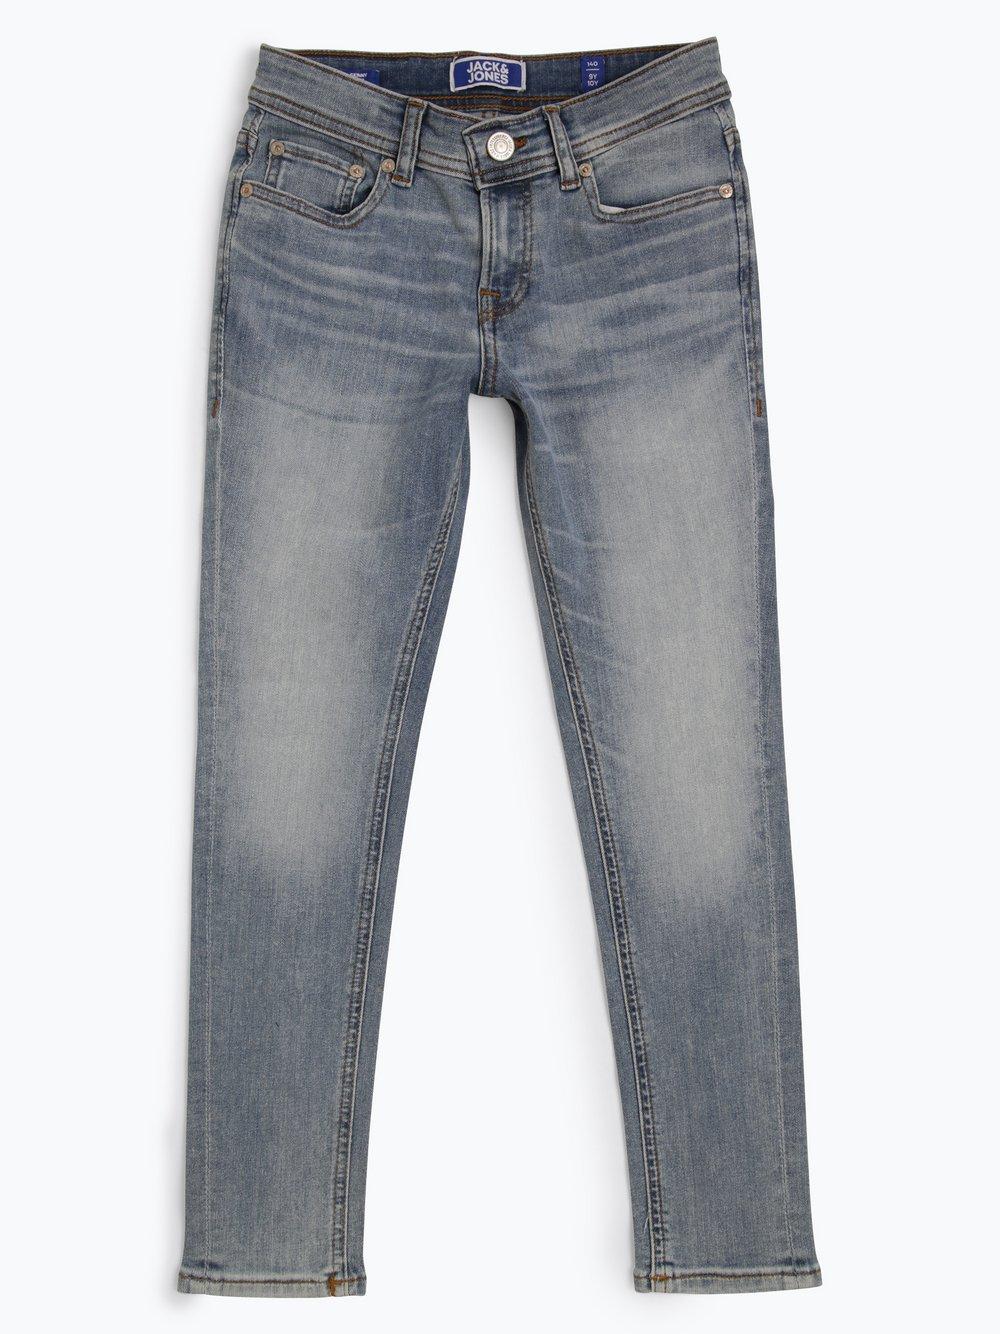 timeless design 1c33f de411 Jack & Jones Jungen Jeans Skinny - Liam online kaufen | PEEK ...